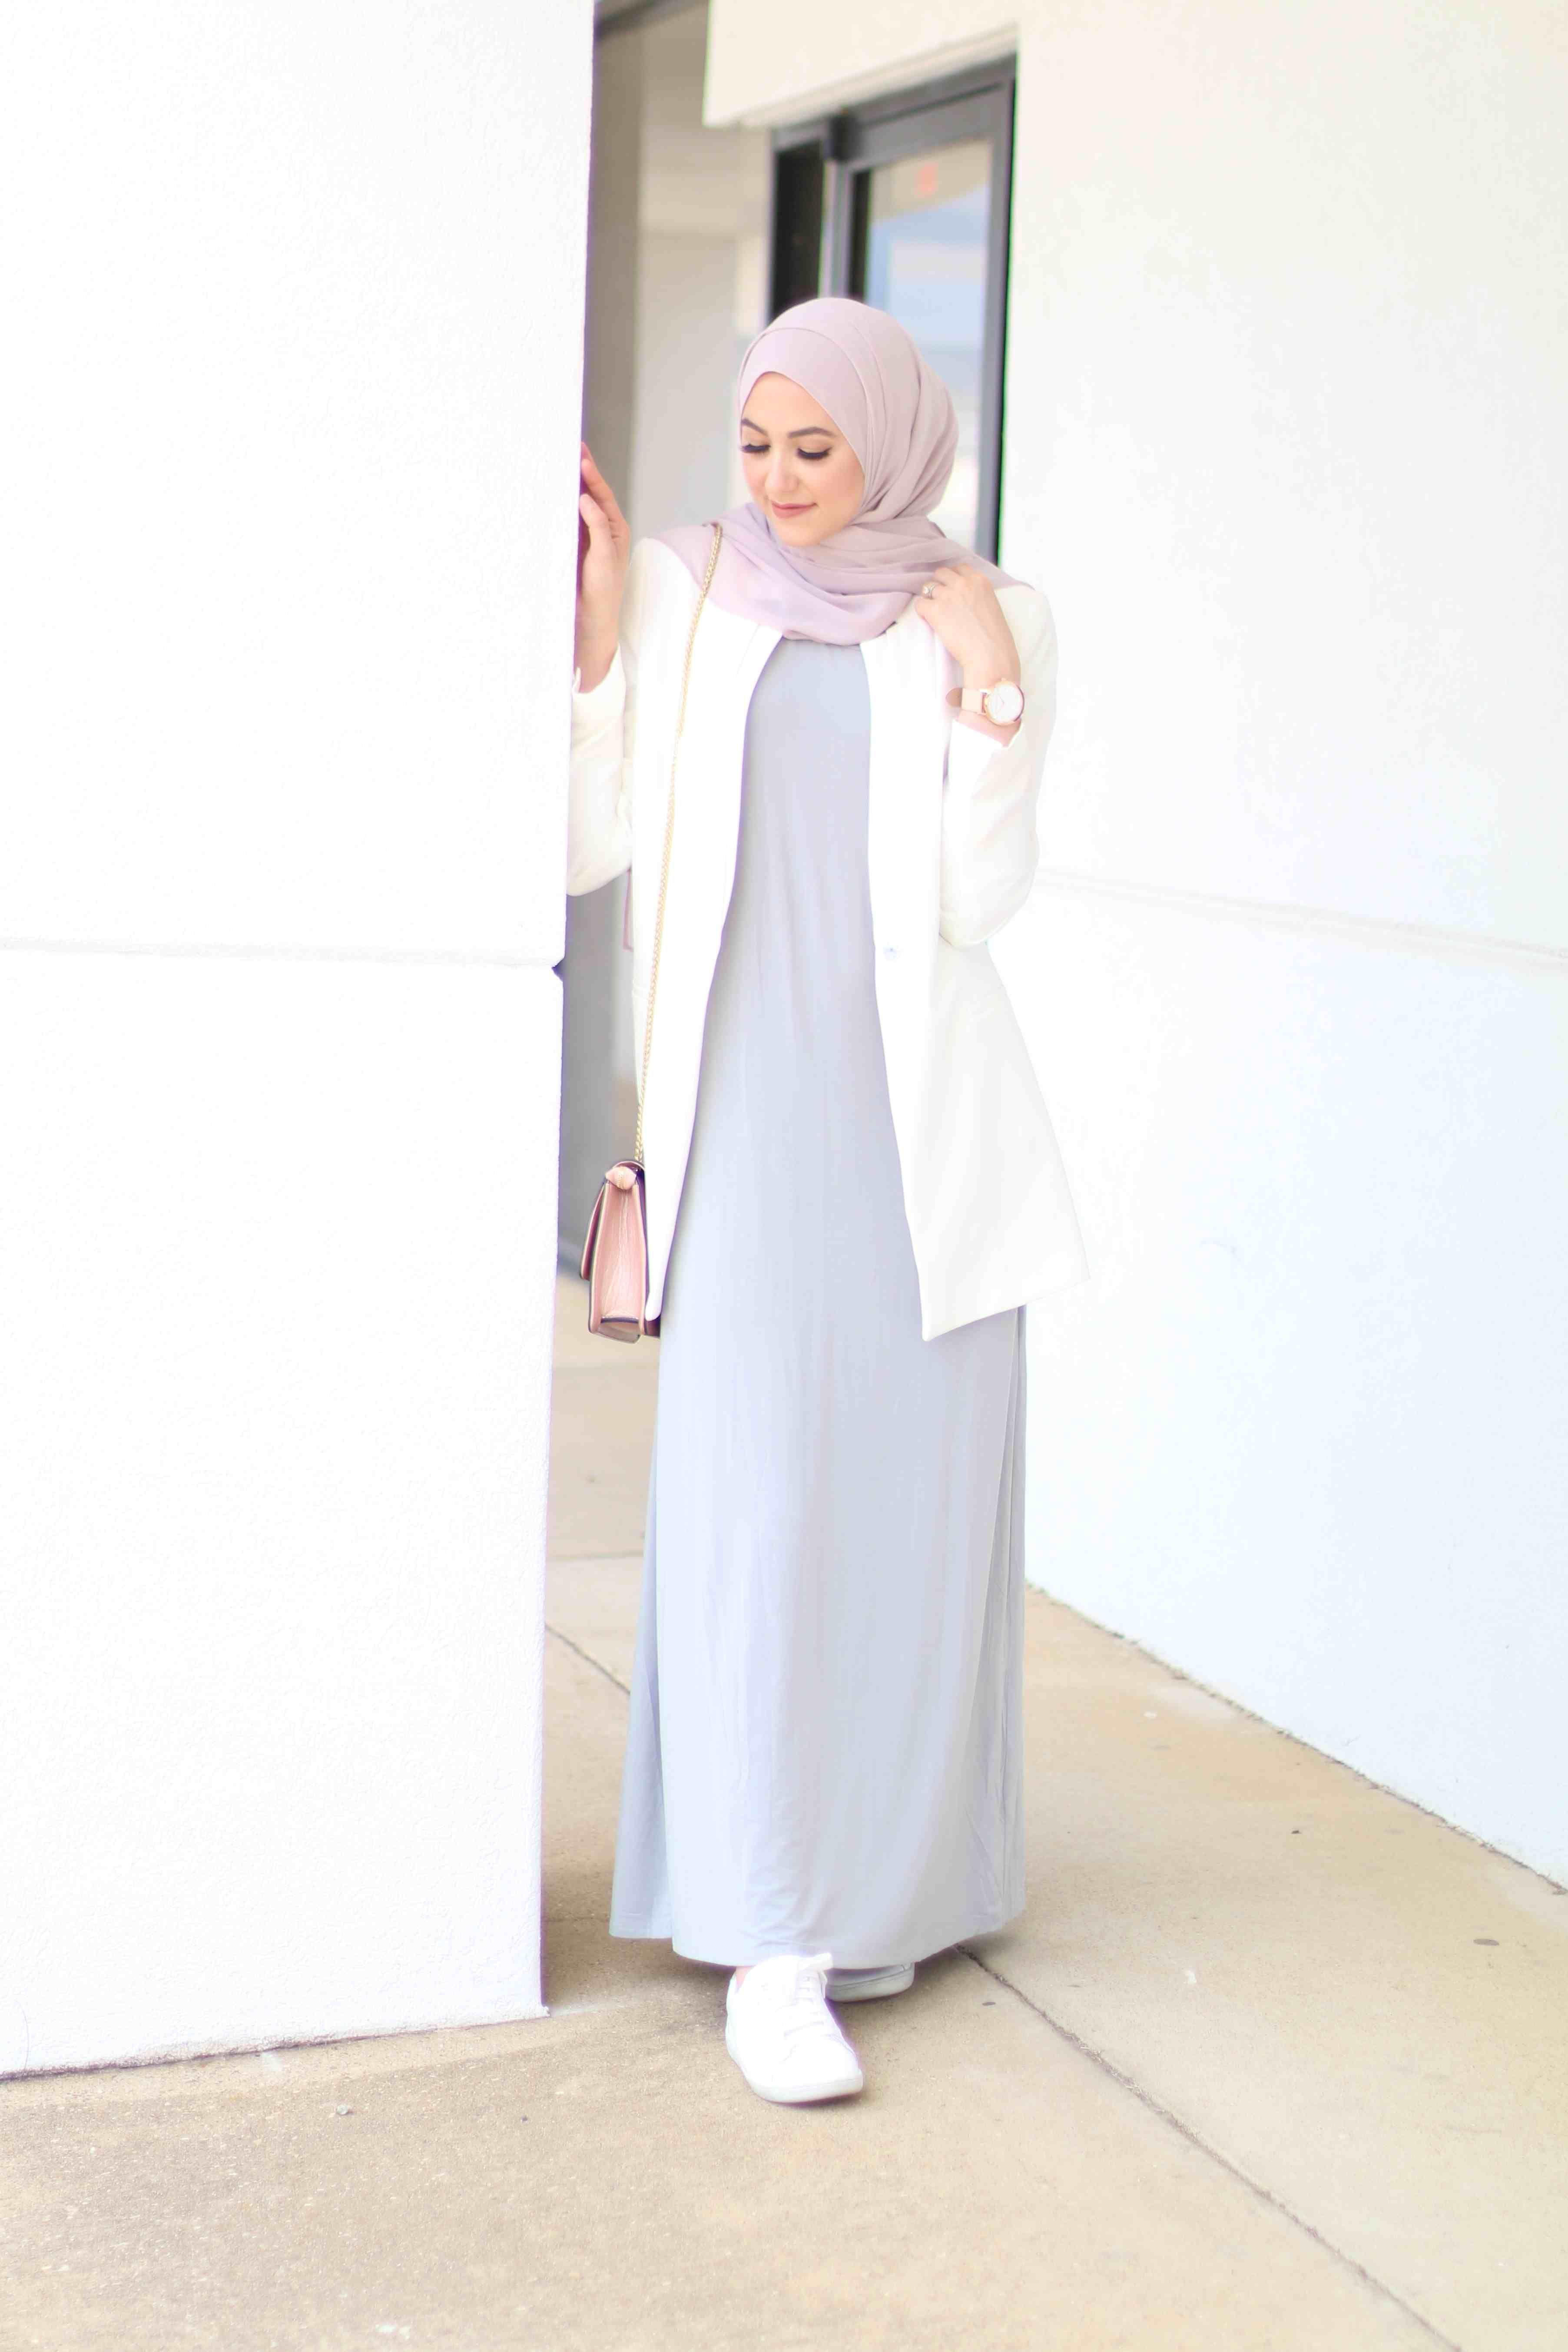 With Love Leena A Fashion Lifestyle Blog By Leena